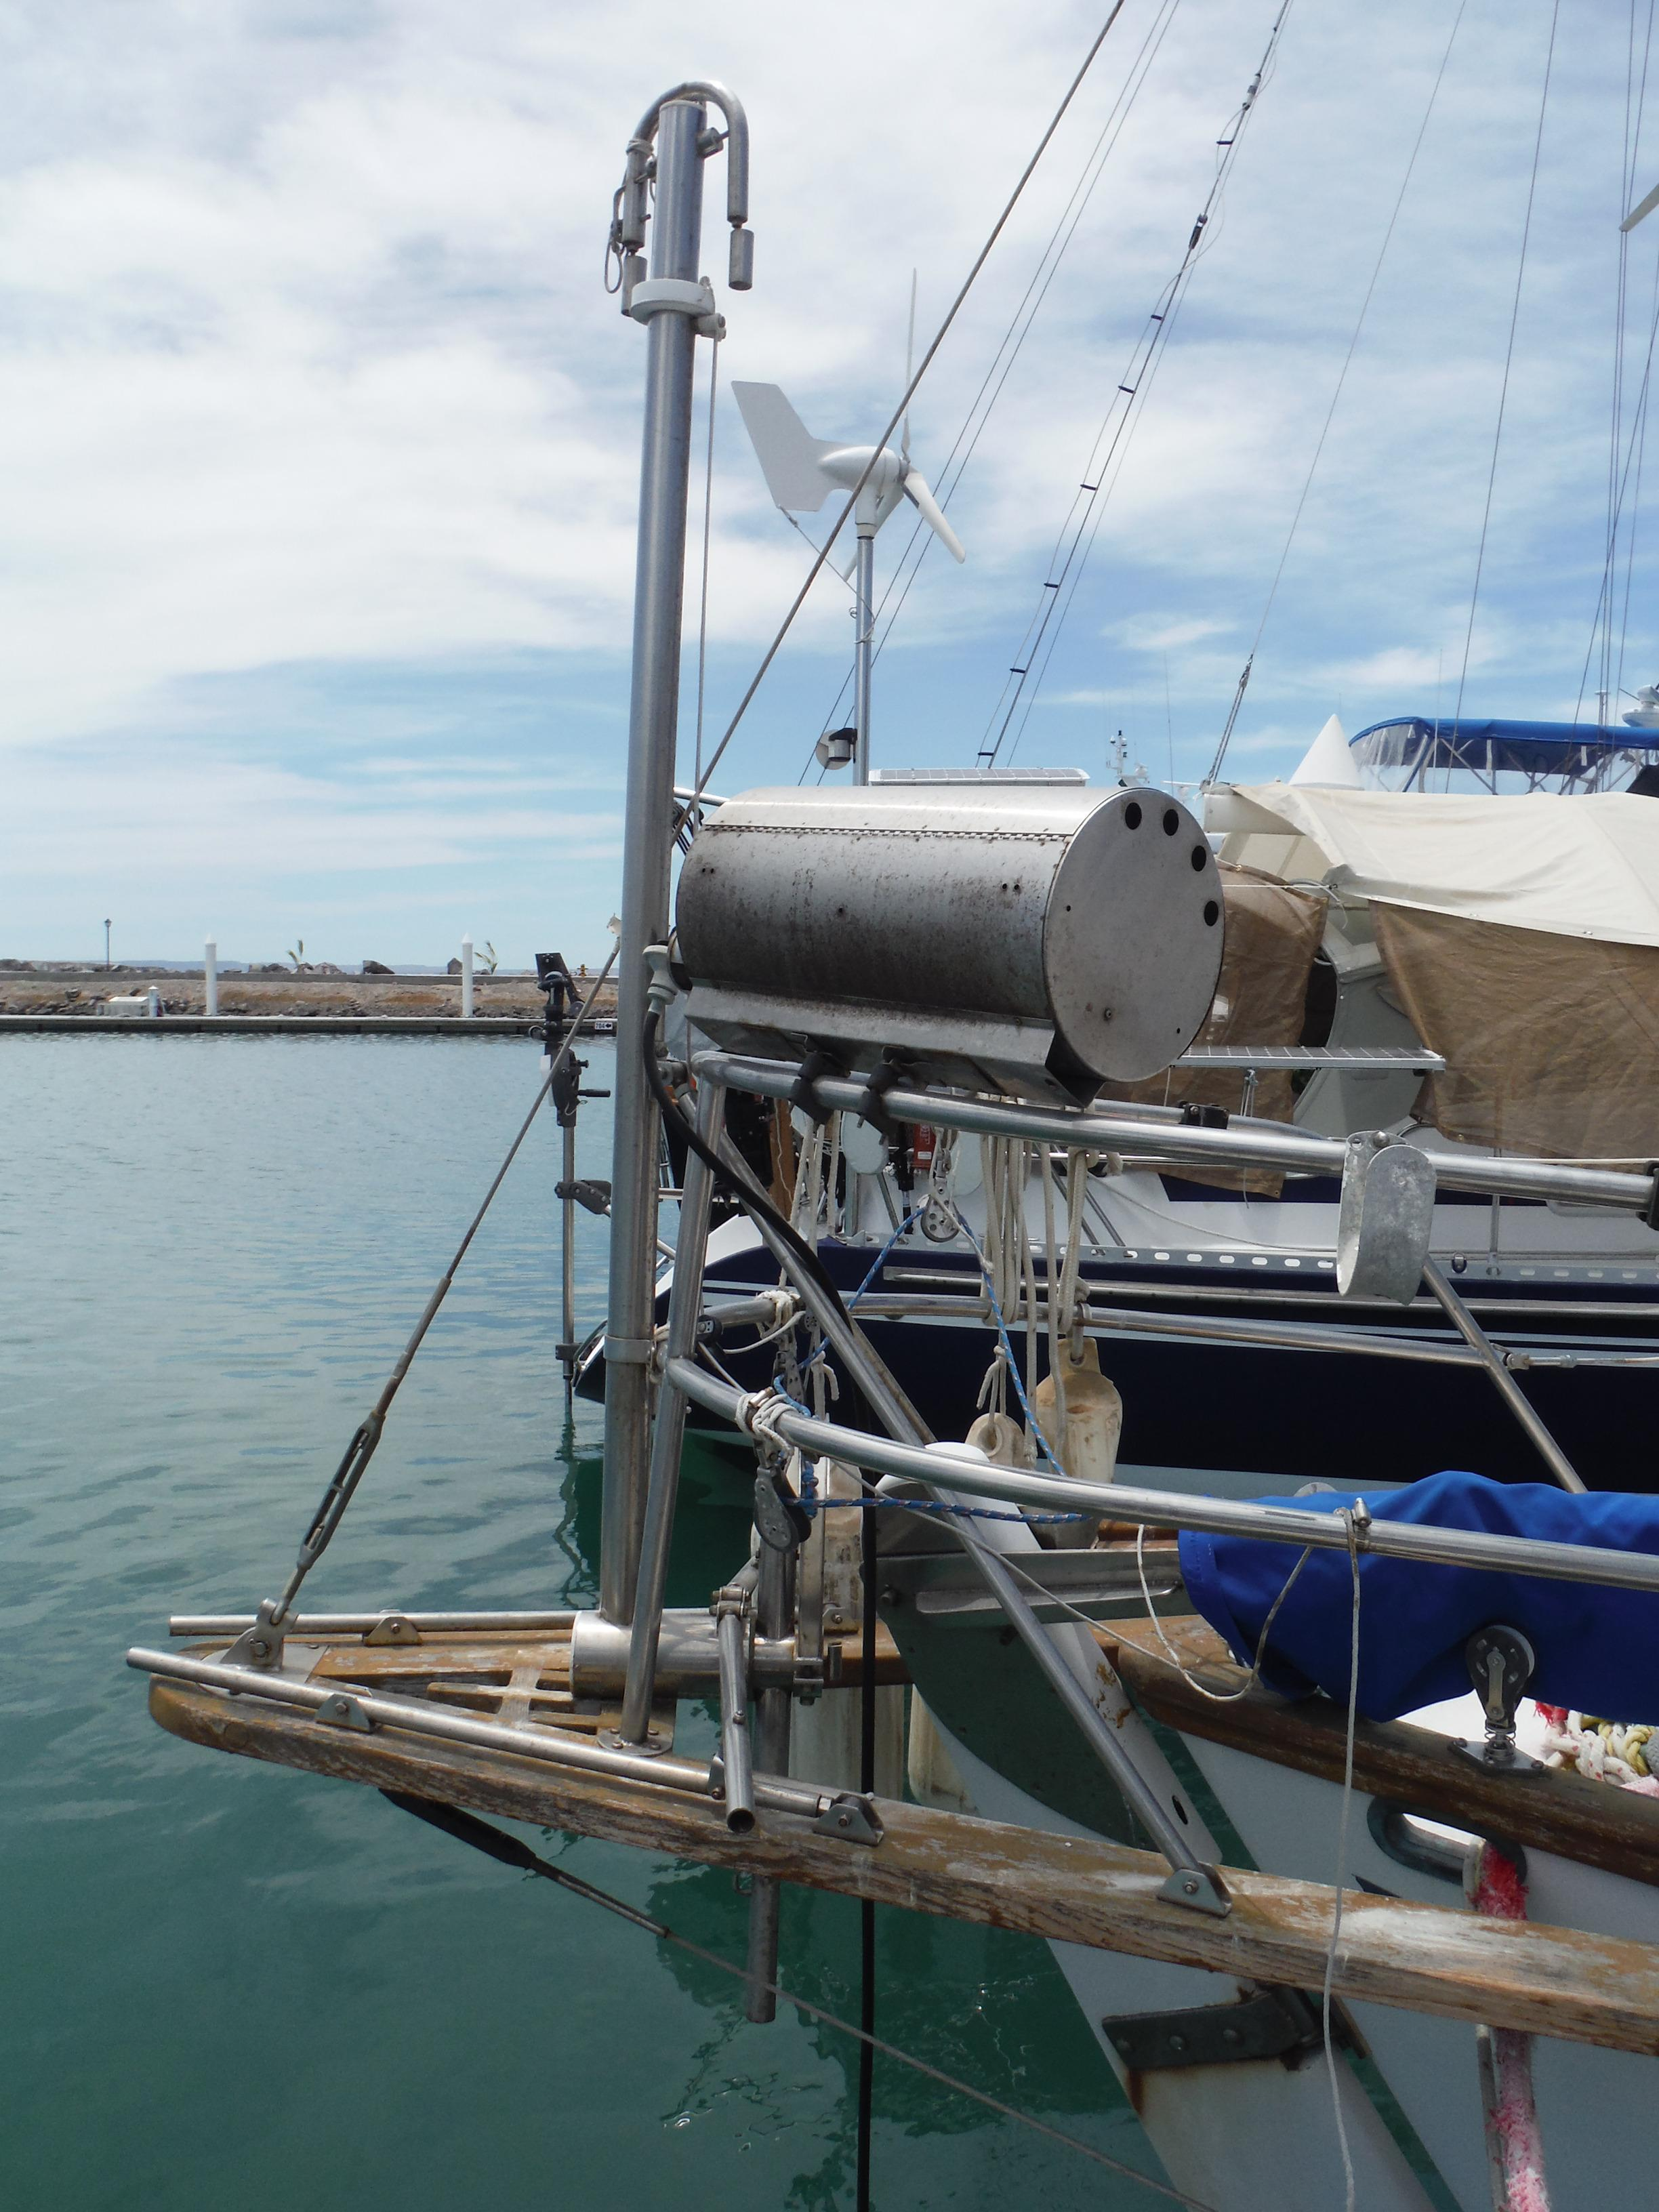 34' Noon Ocean 34 Cutter+Photo 15